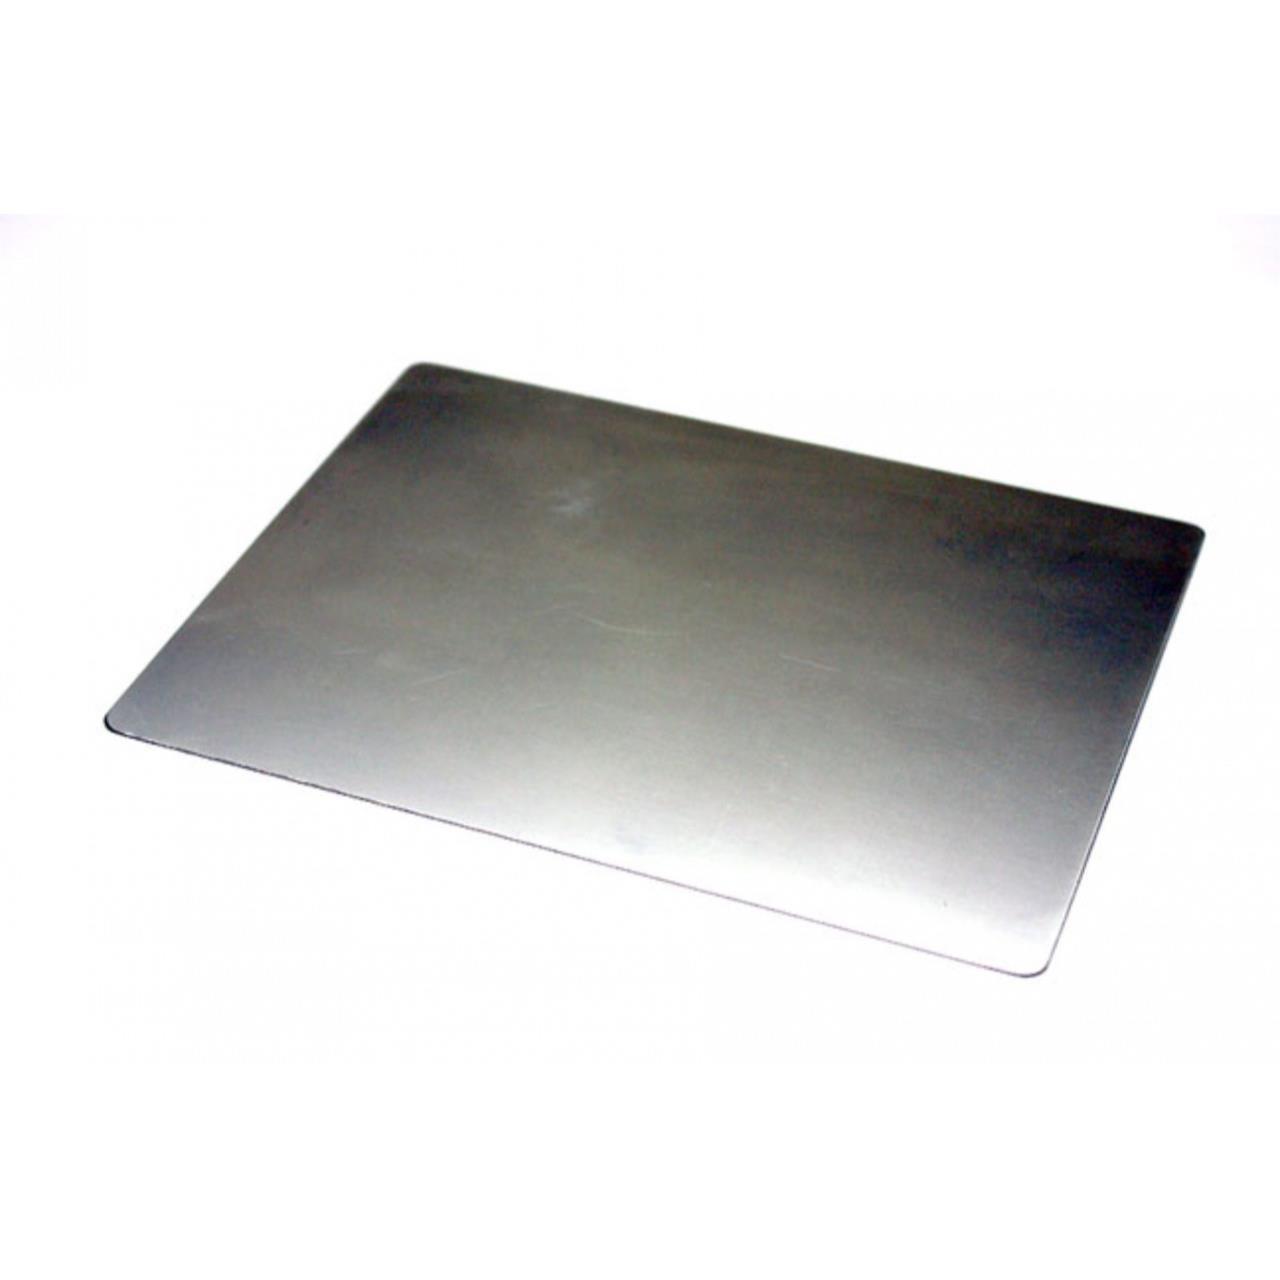 Metal Adaptor Plate, Cheery Lynn Designs -